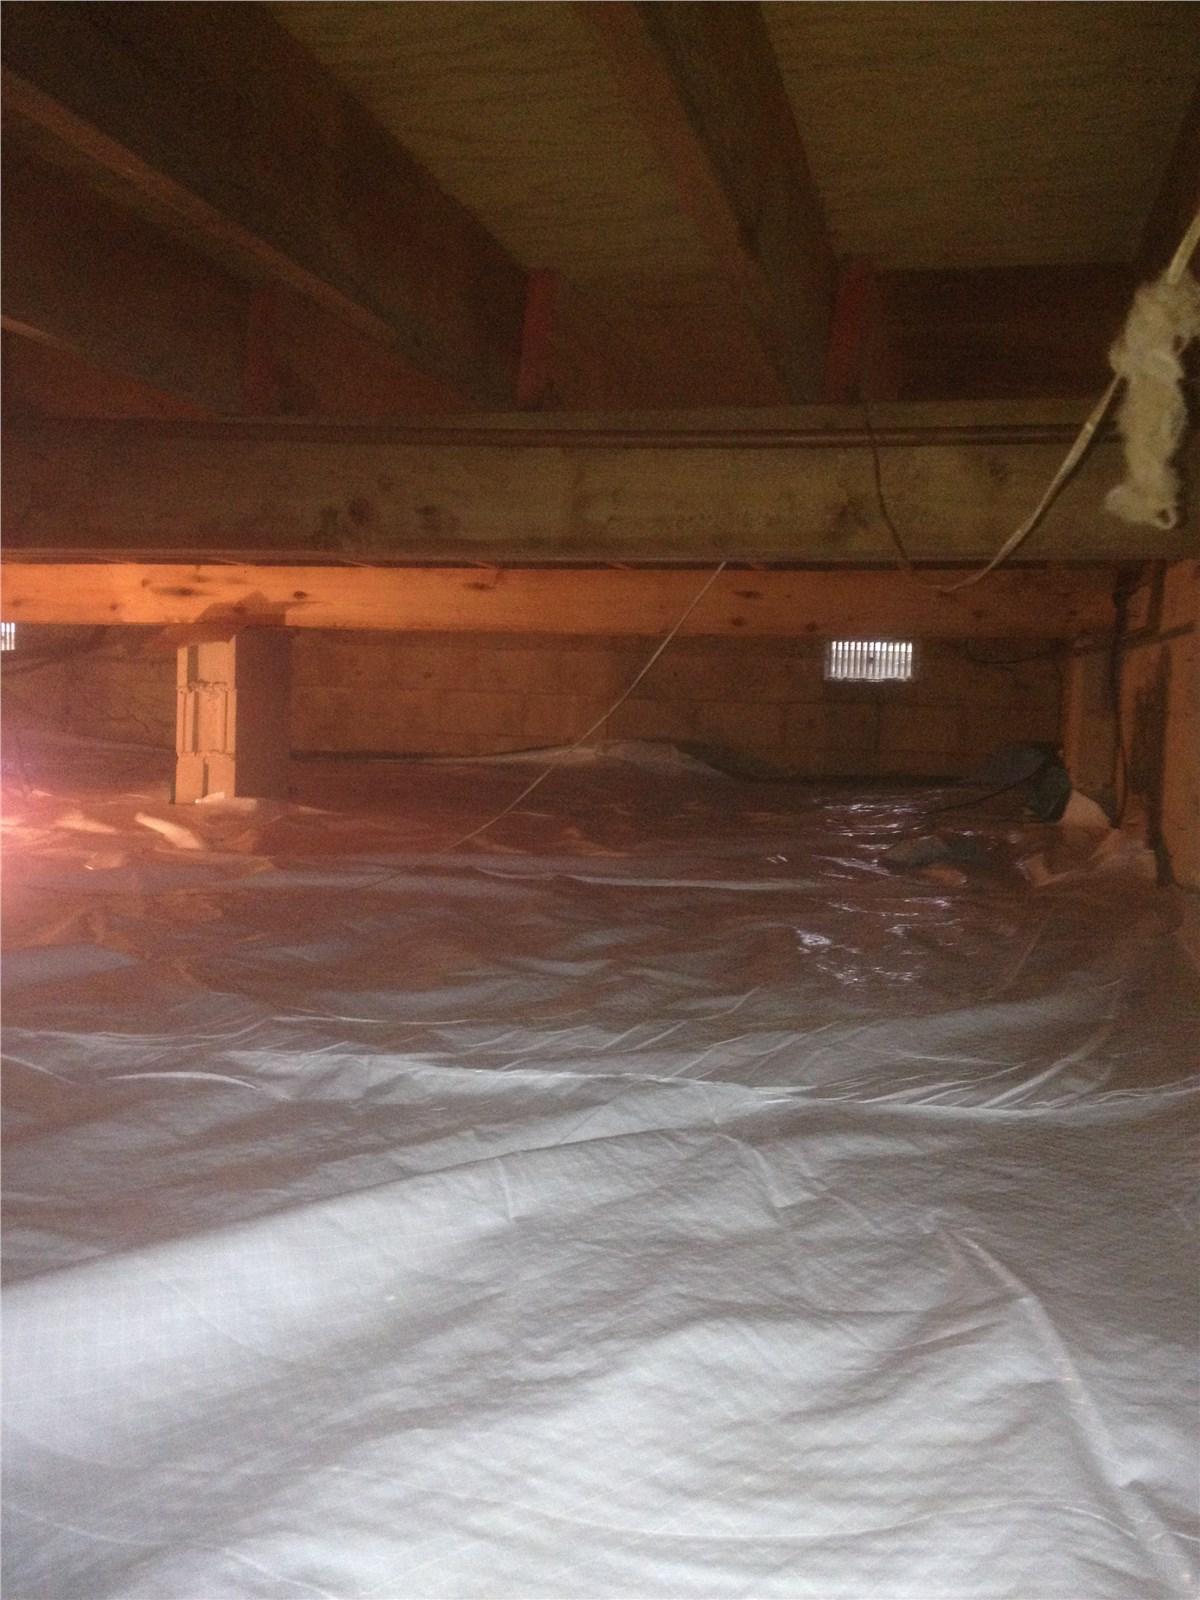 Crawlspace Waterproofing   Basement Waterproofing Solutions